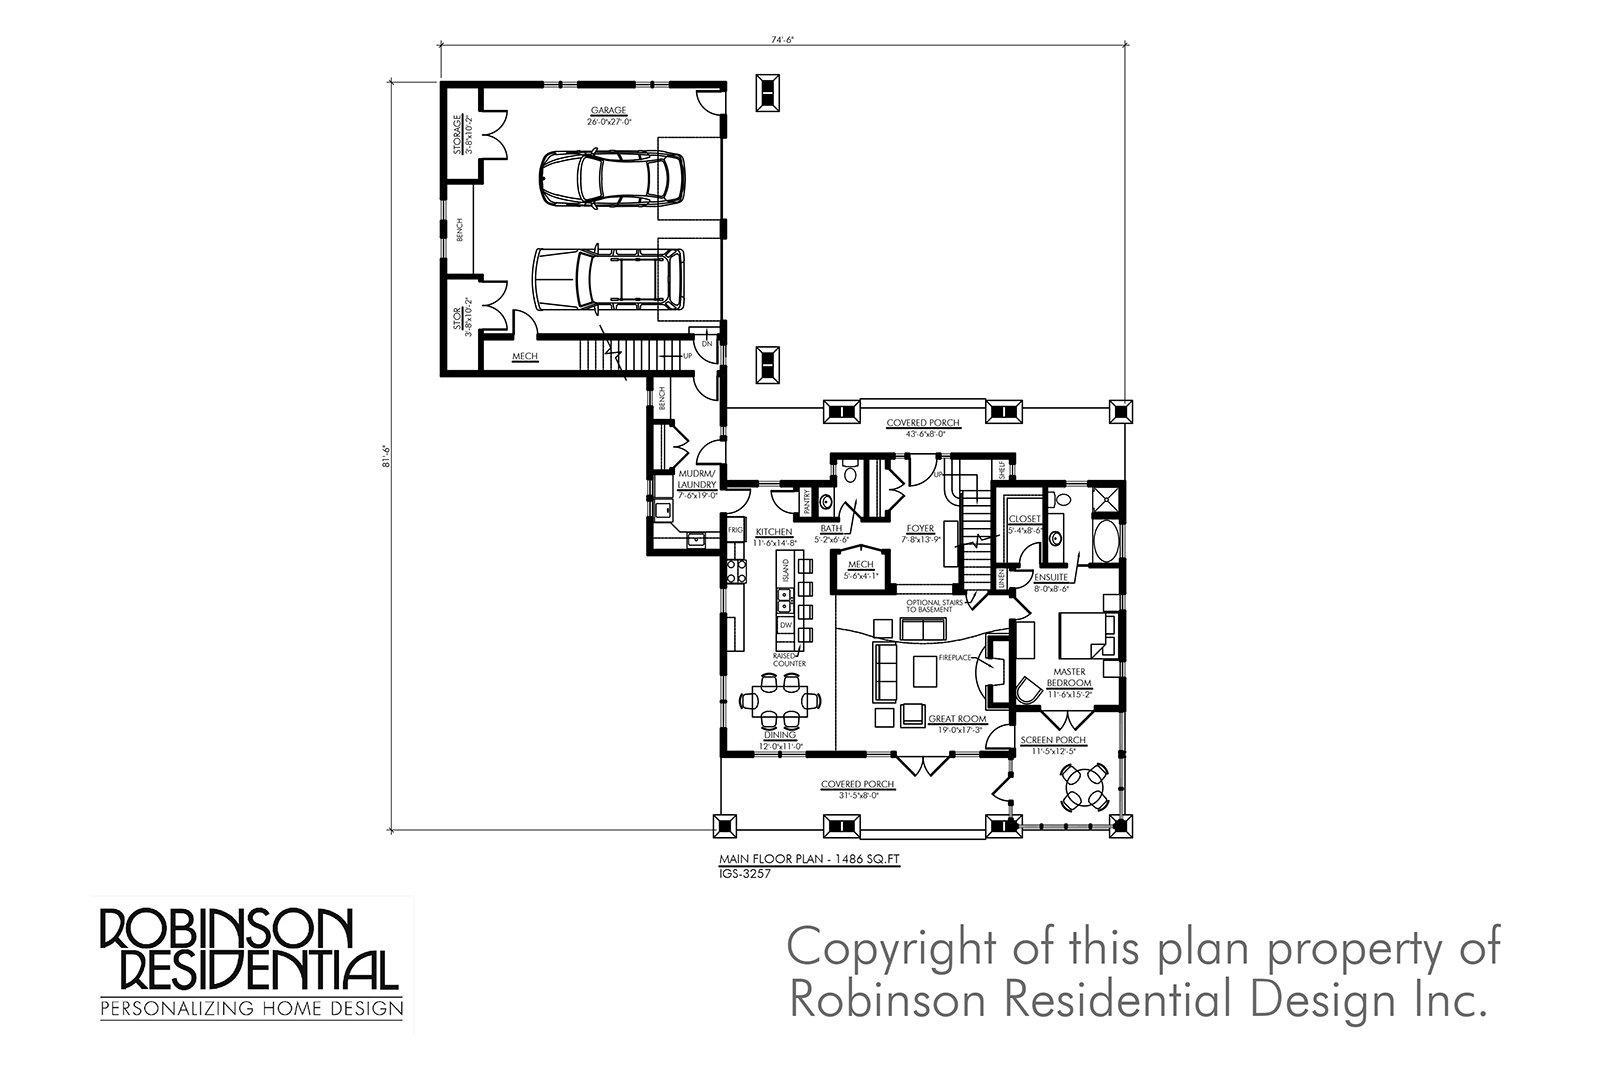 Igs 3257   craftsman home plan   01 main floor plan